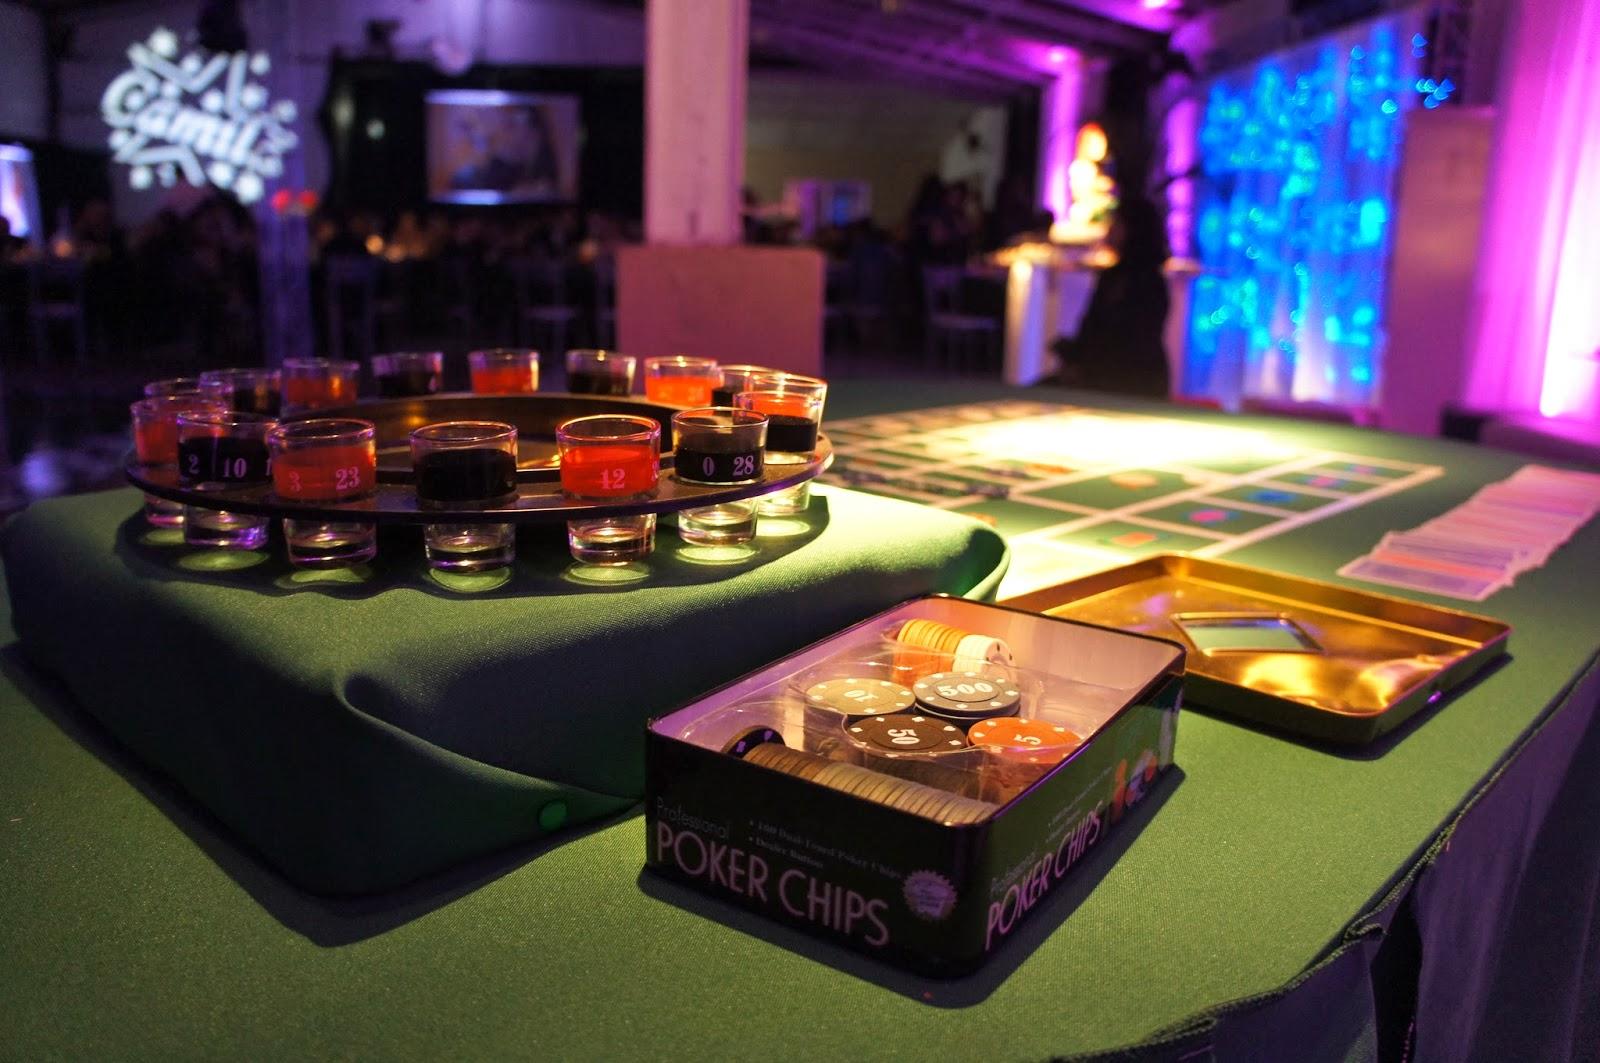 Royal ace casino codes 2020